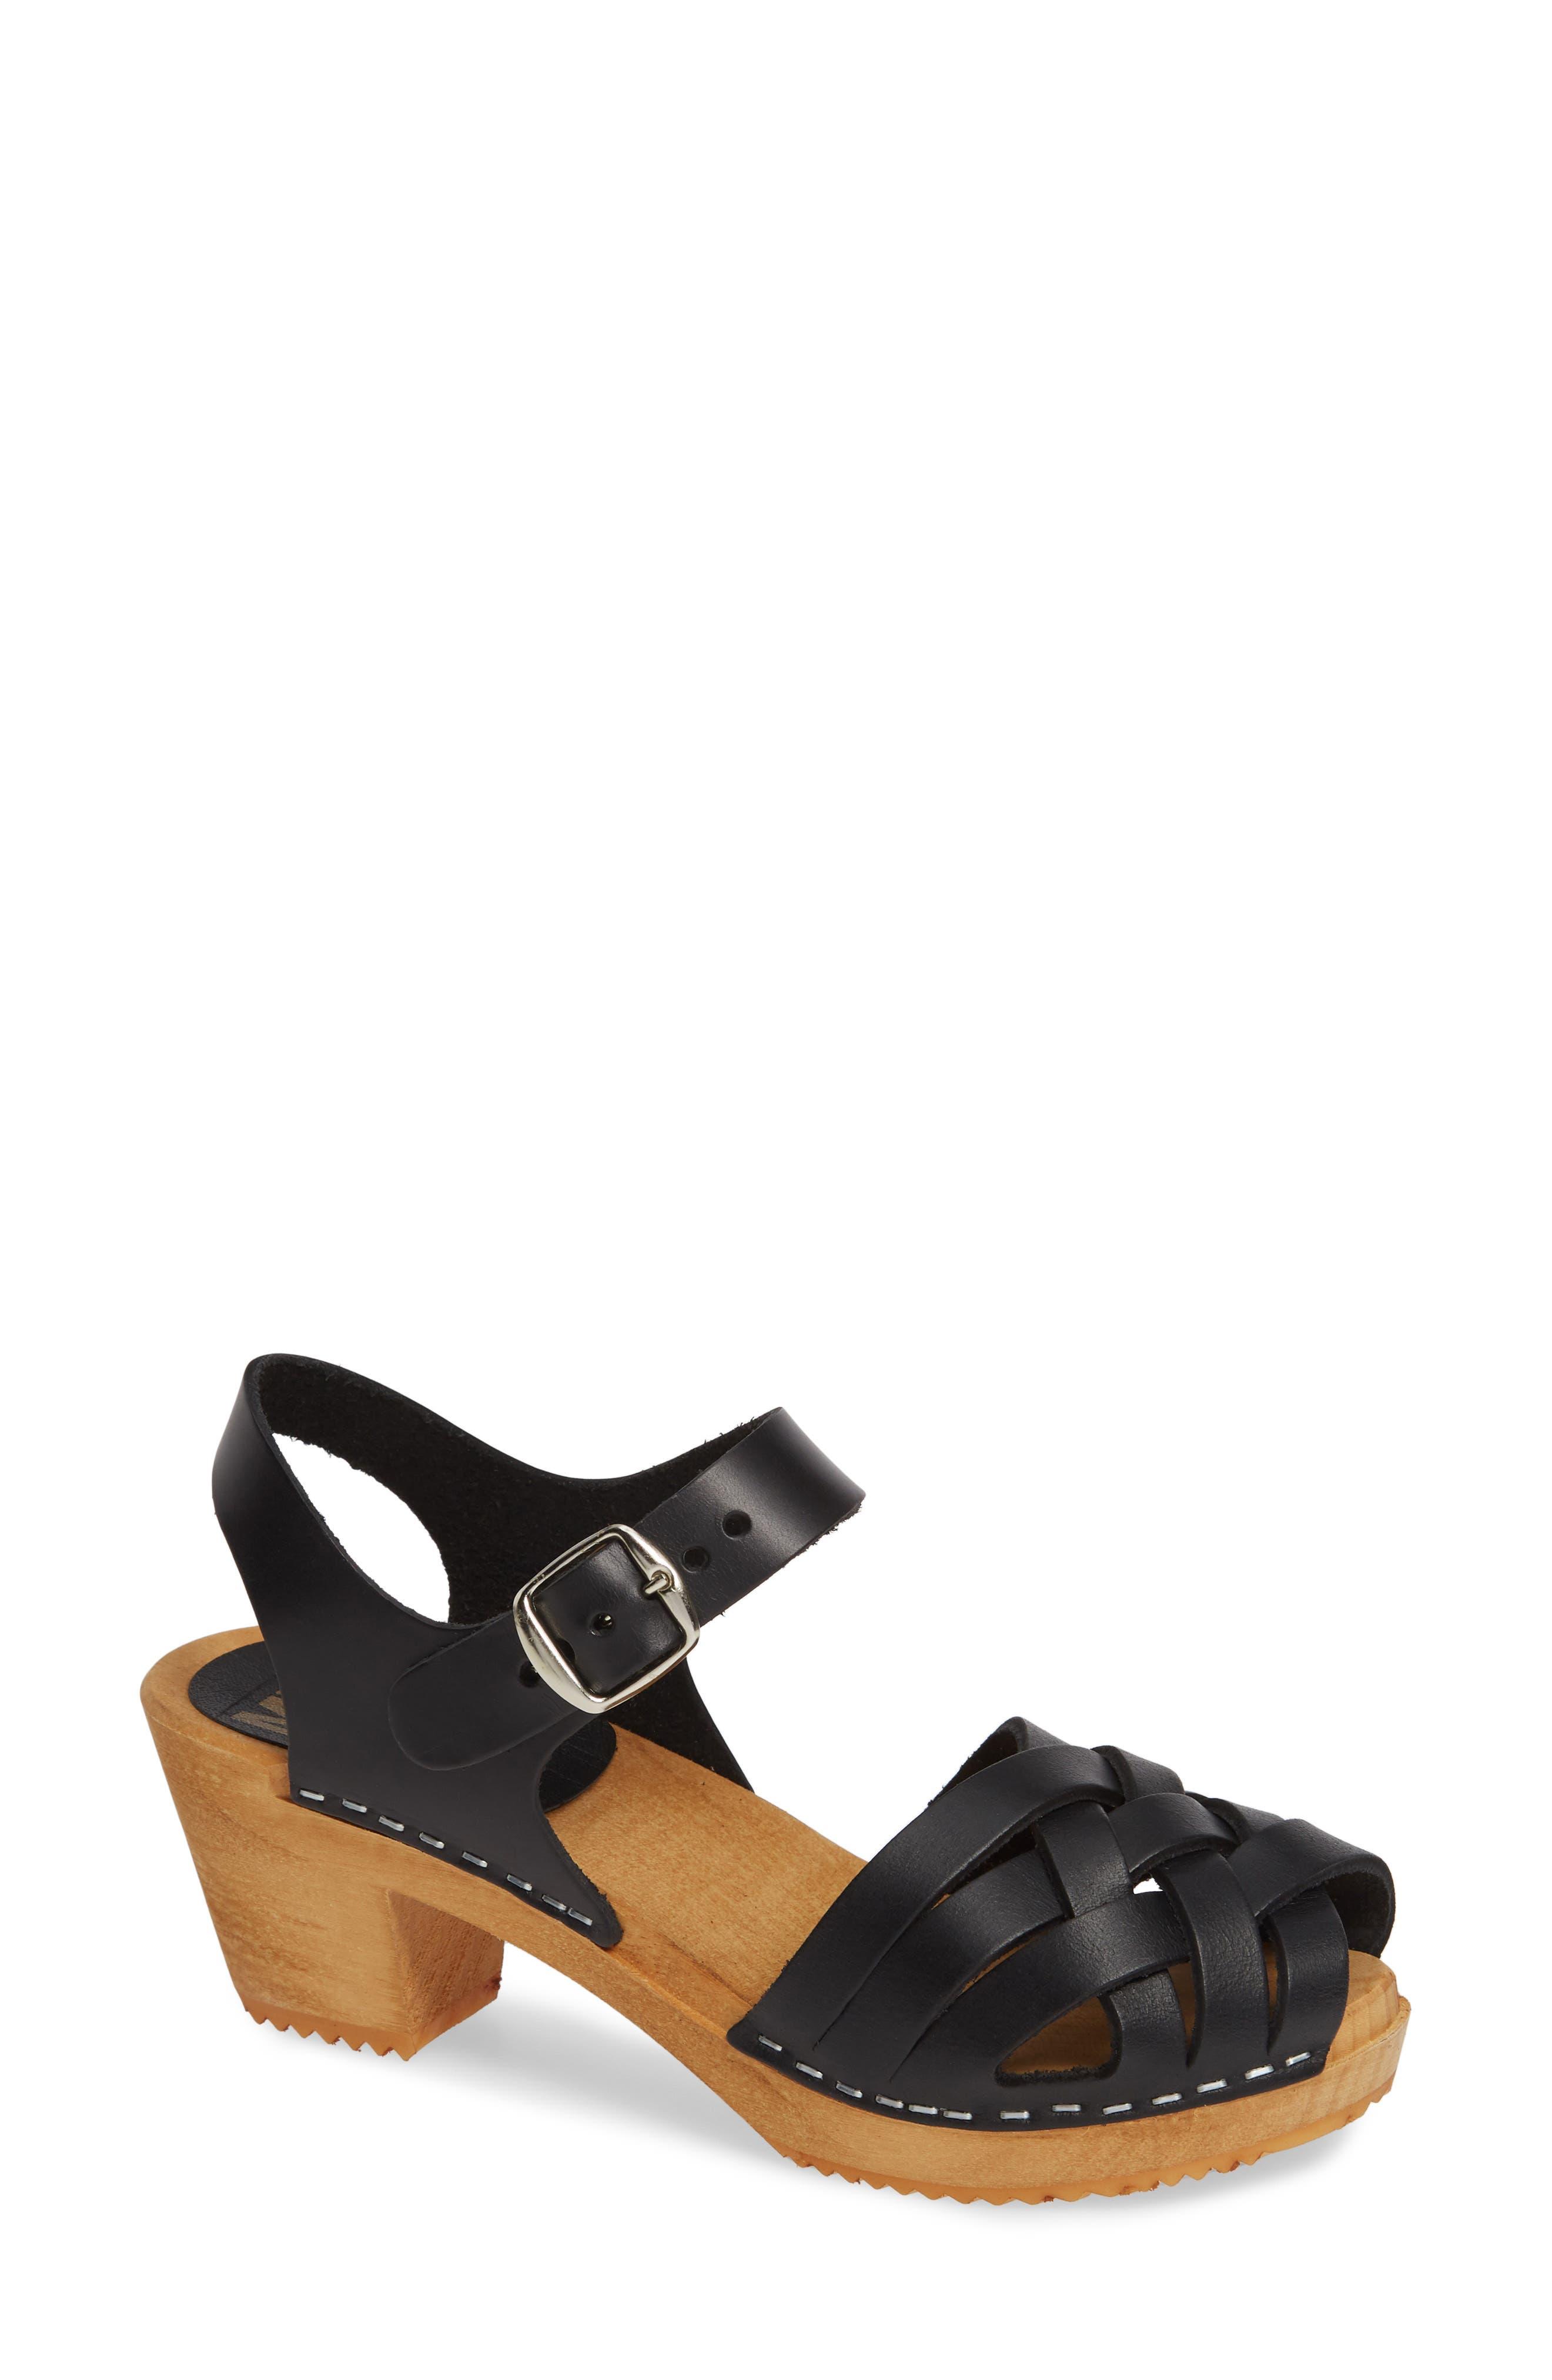 Bety Clog Sandal, Main, color, BLACK LEATHER